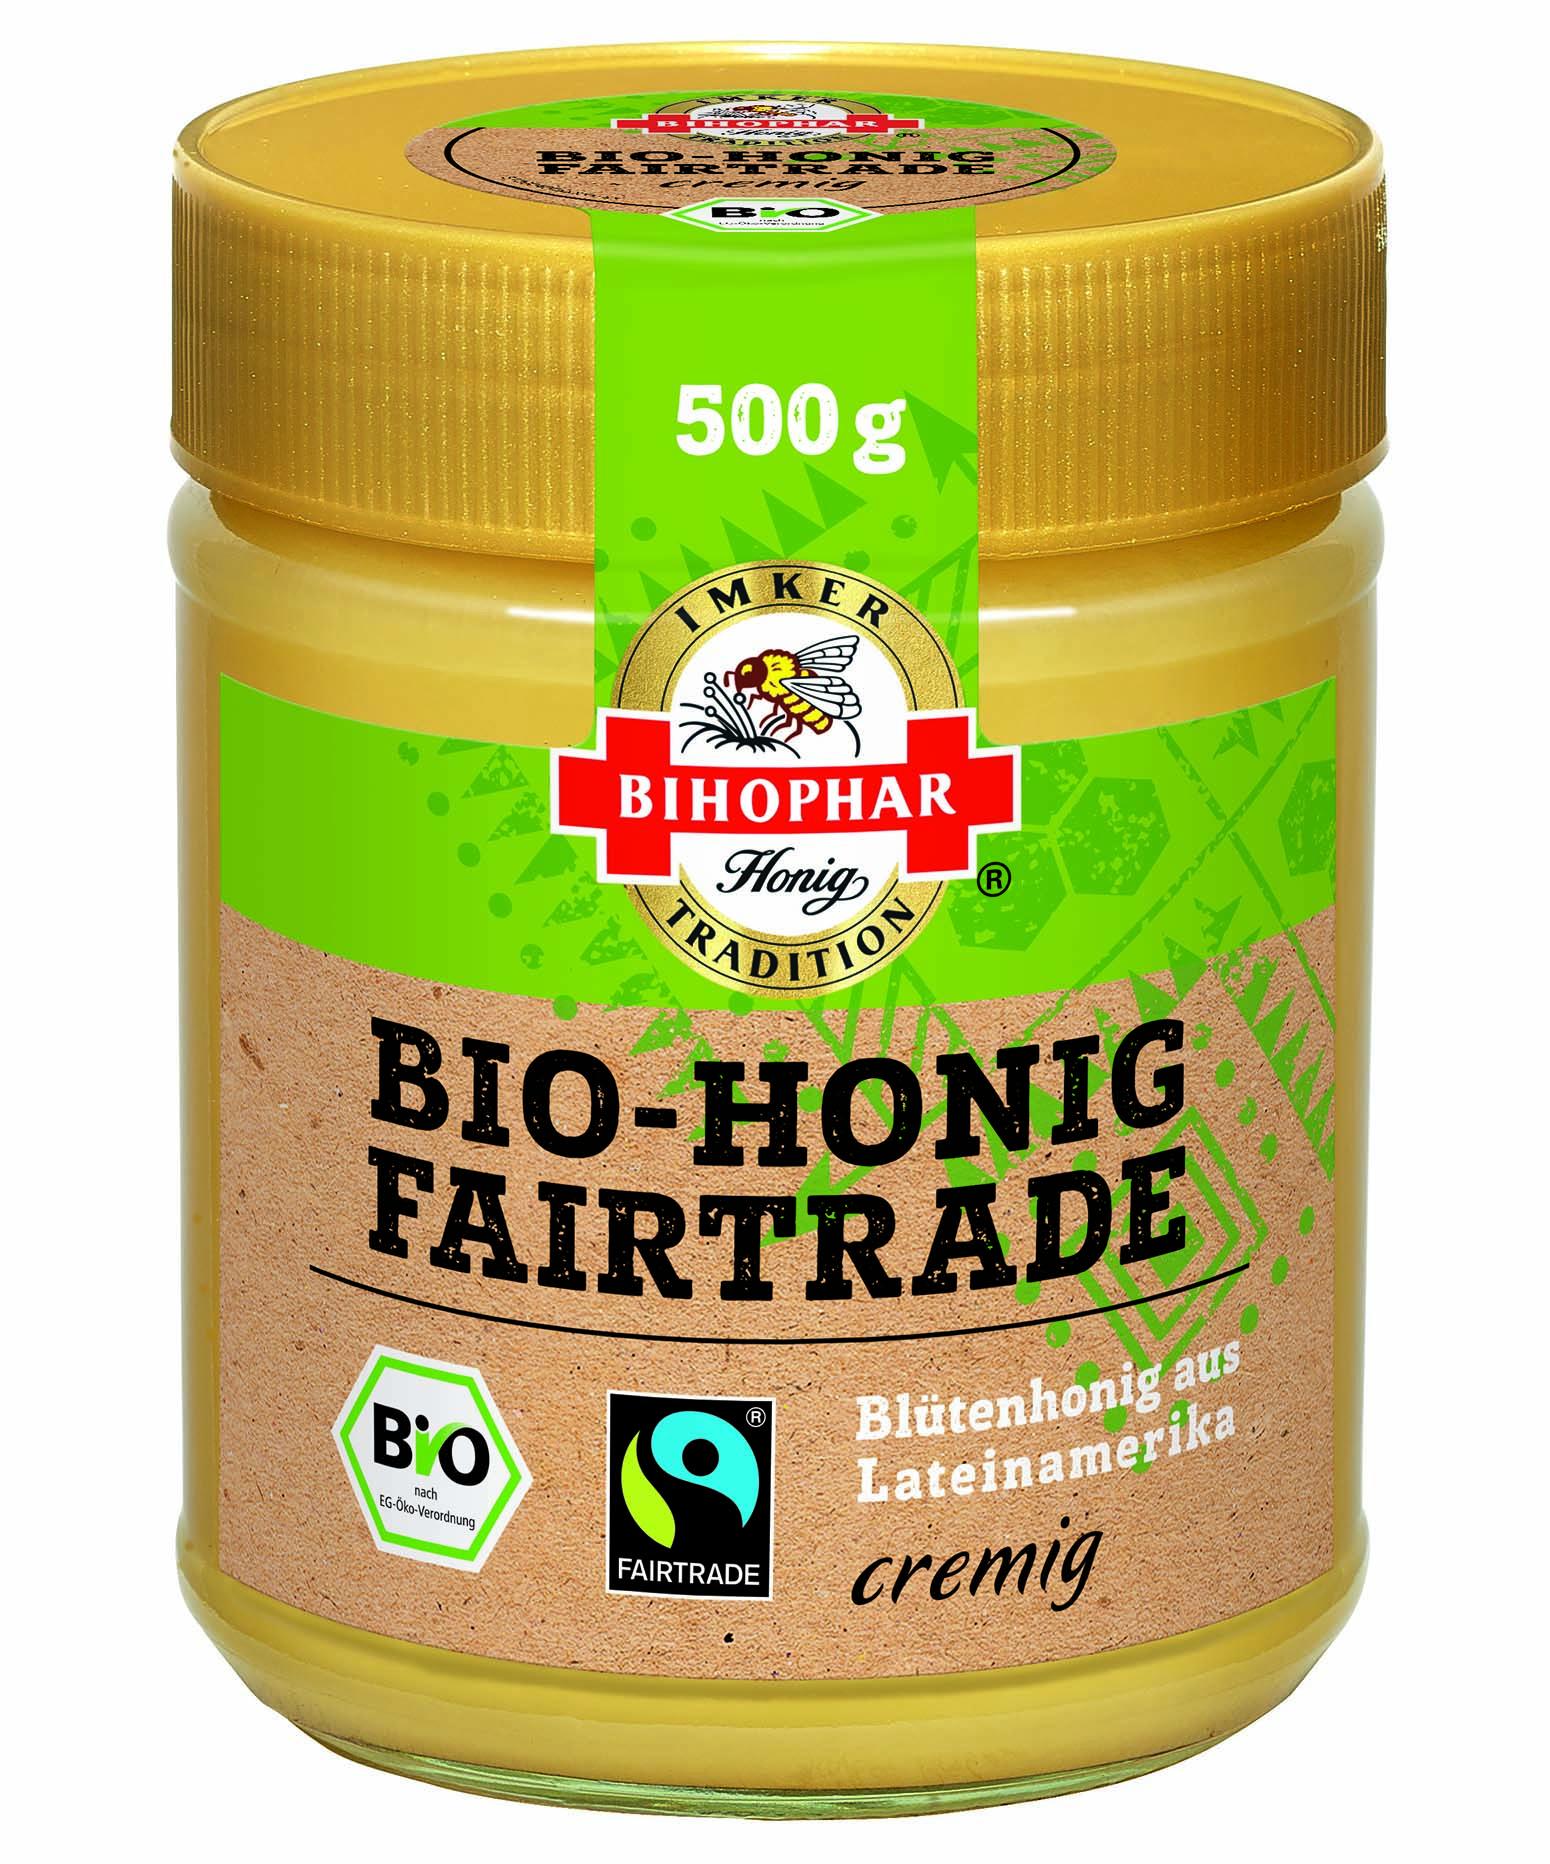 Bihopohar Bio-Honig Fairtrade, cremig